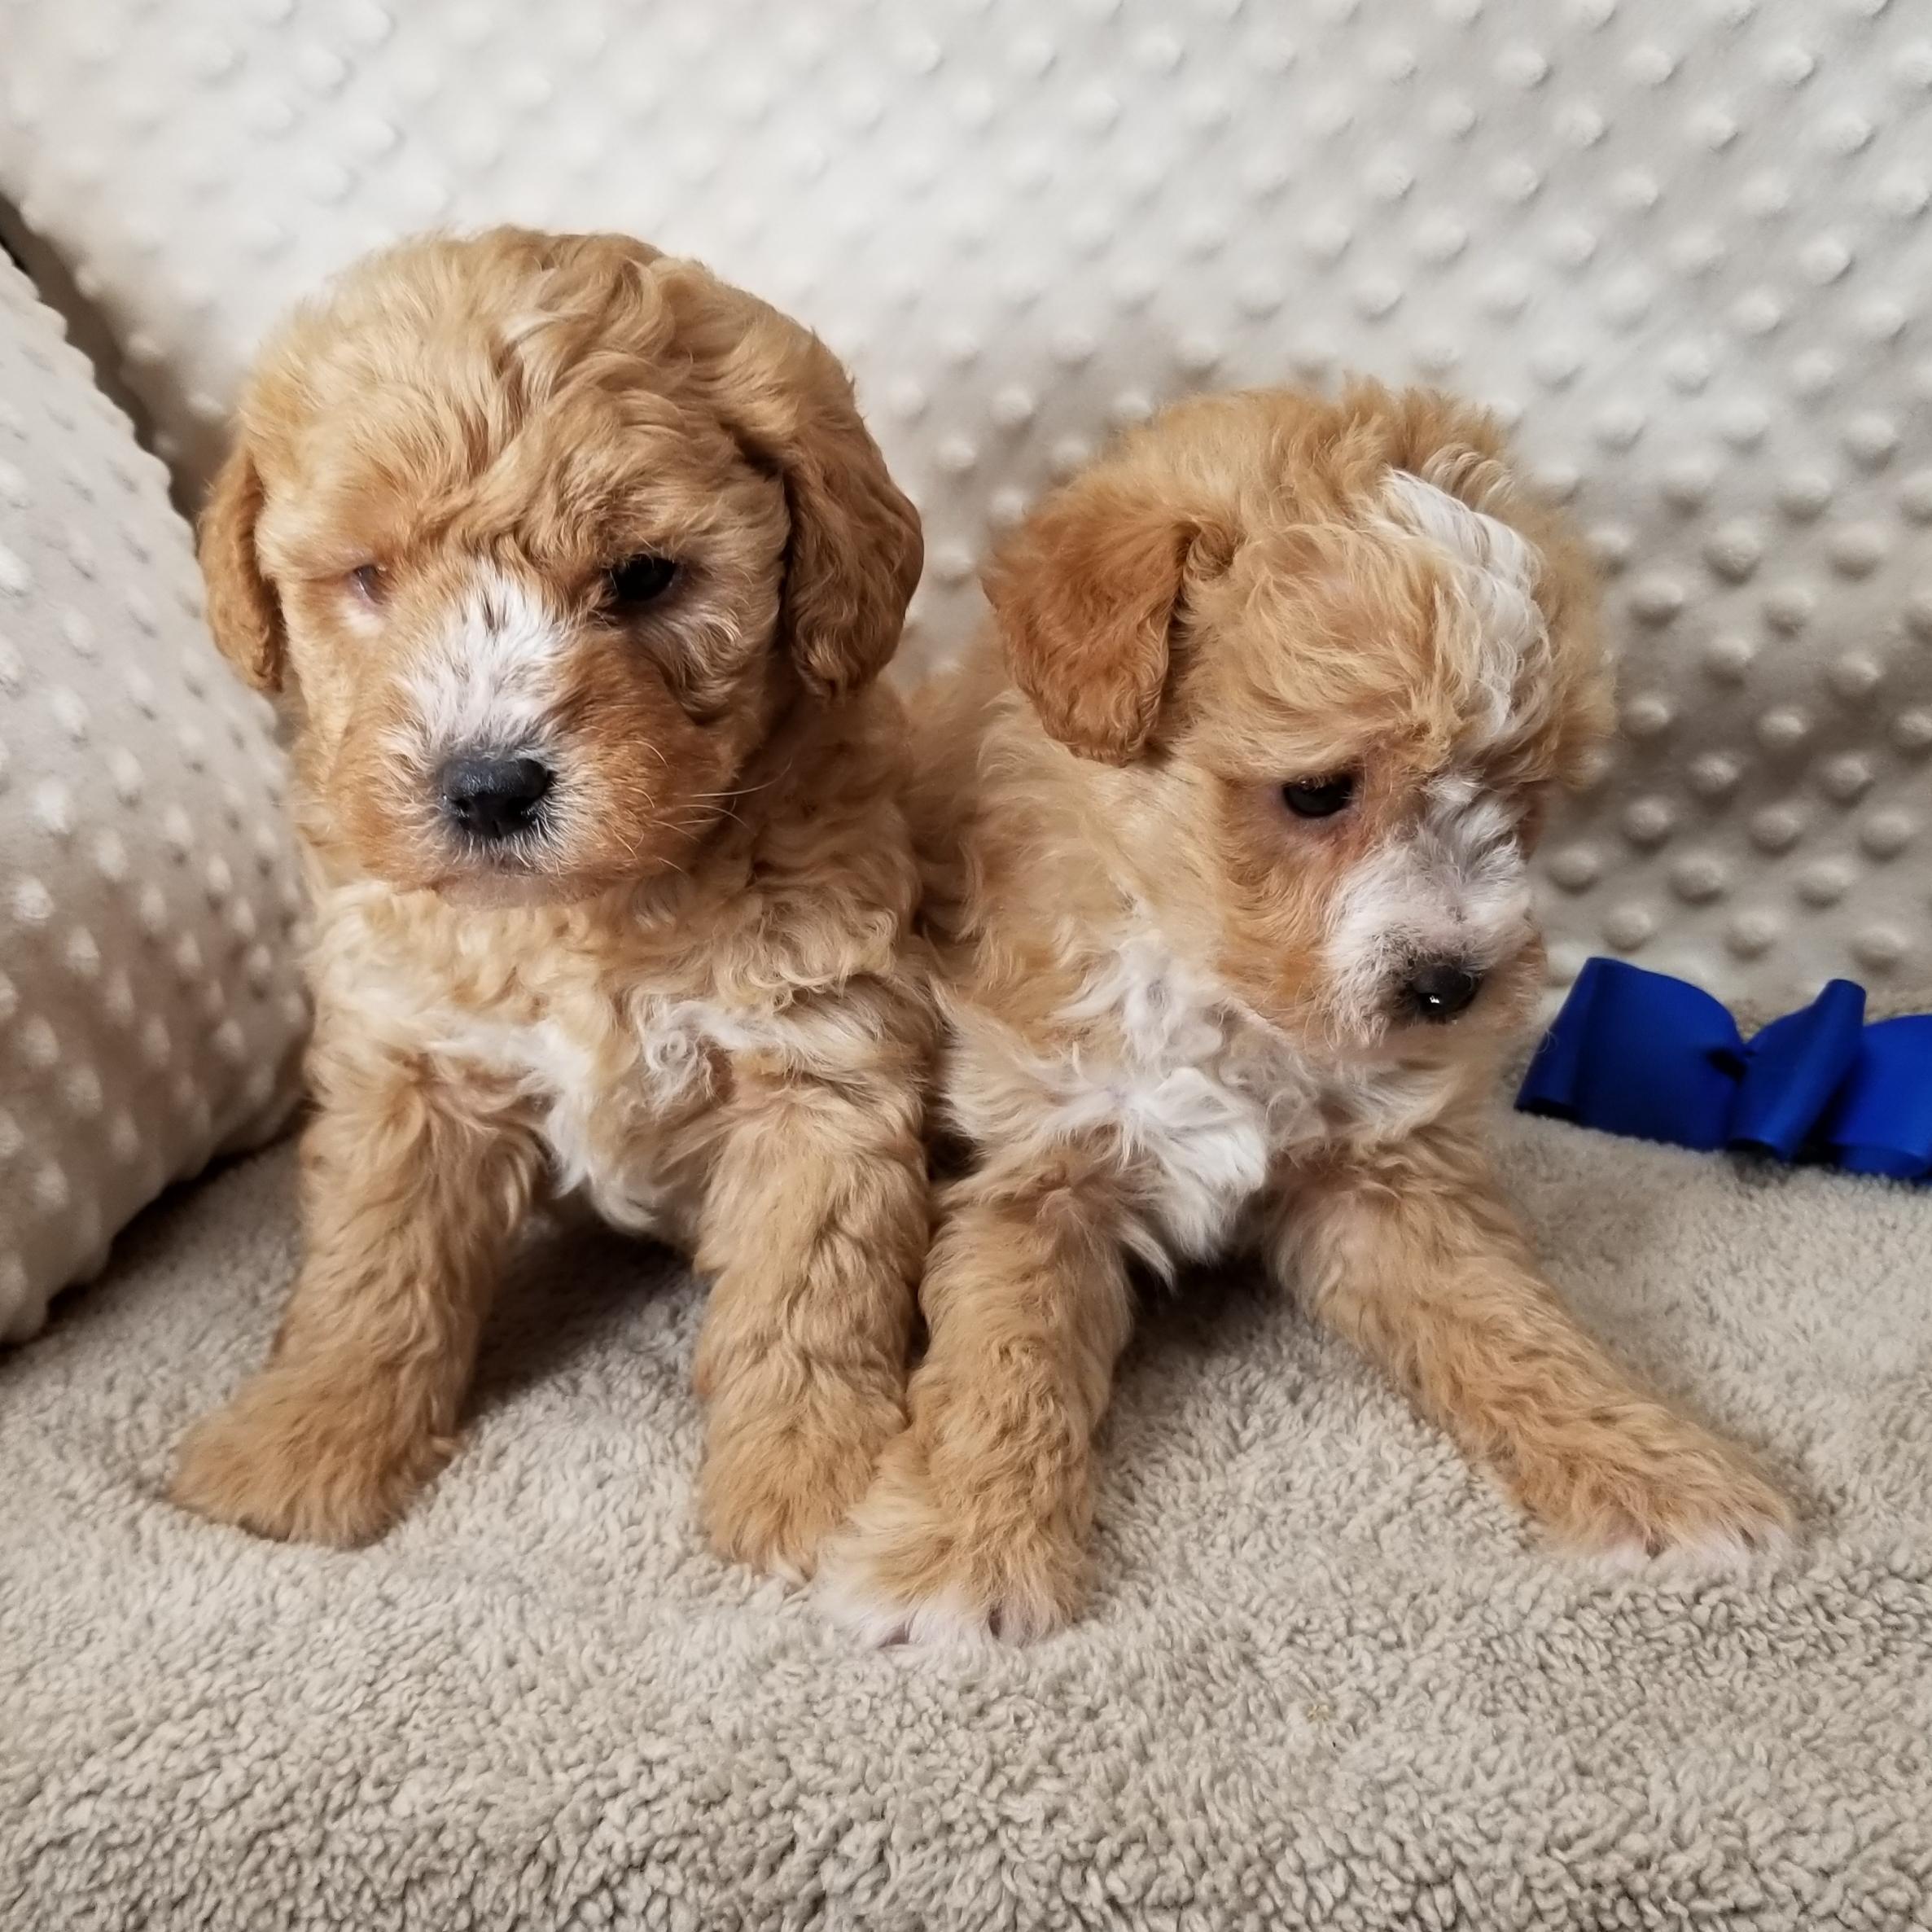 CKC ShorkiePoo Male Puppies born on12/14,2020 Saturday $800 each.